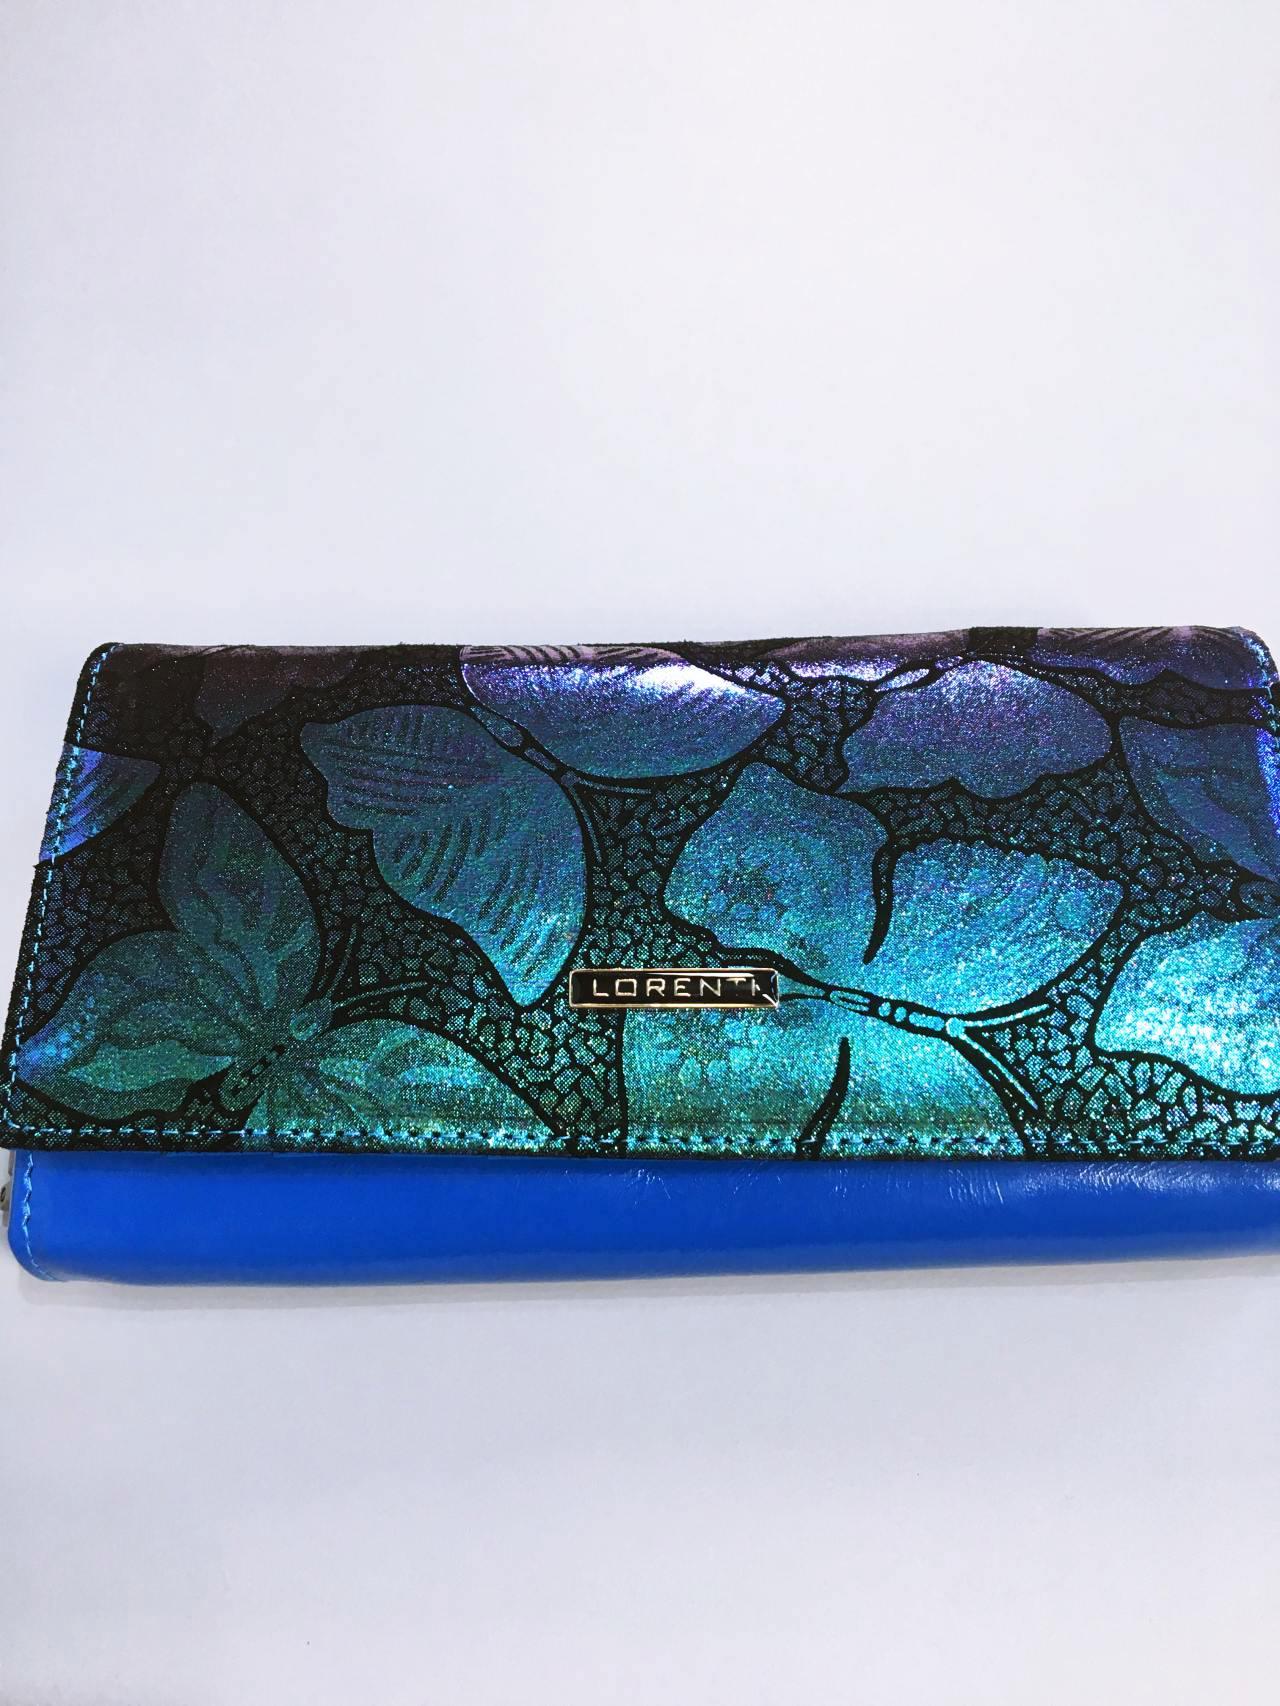 Kožená peněženka Lorenti Silver Blue 01